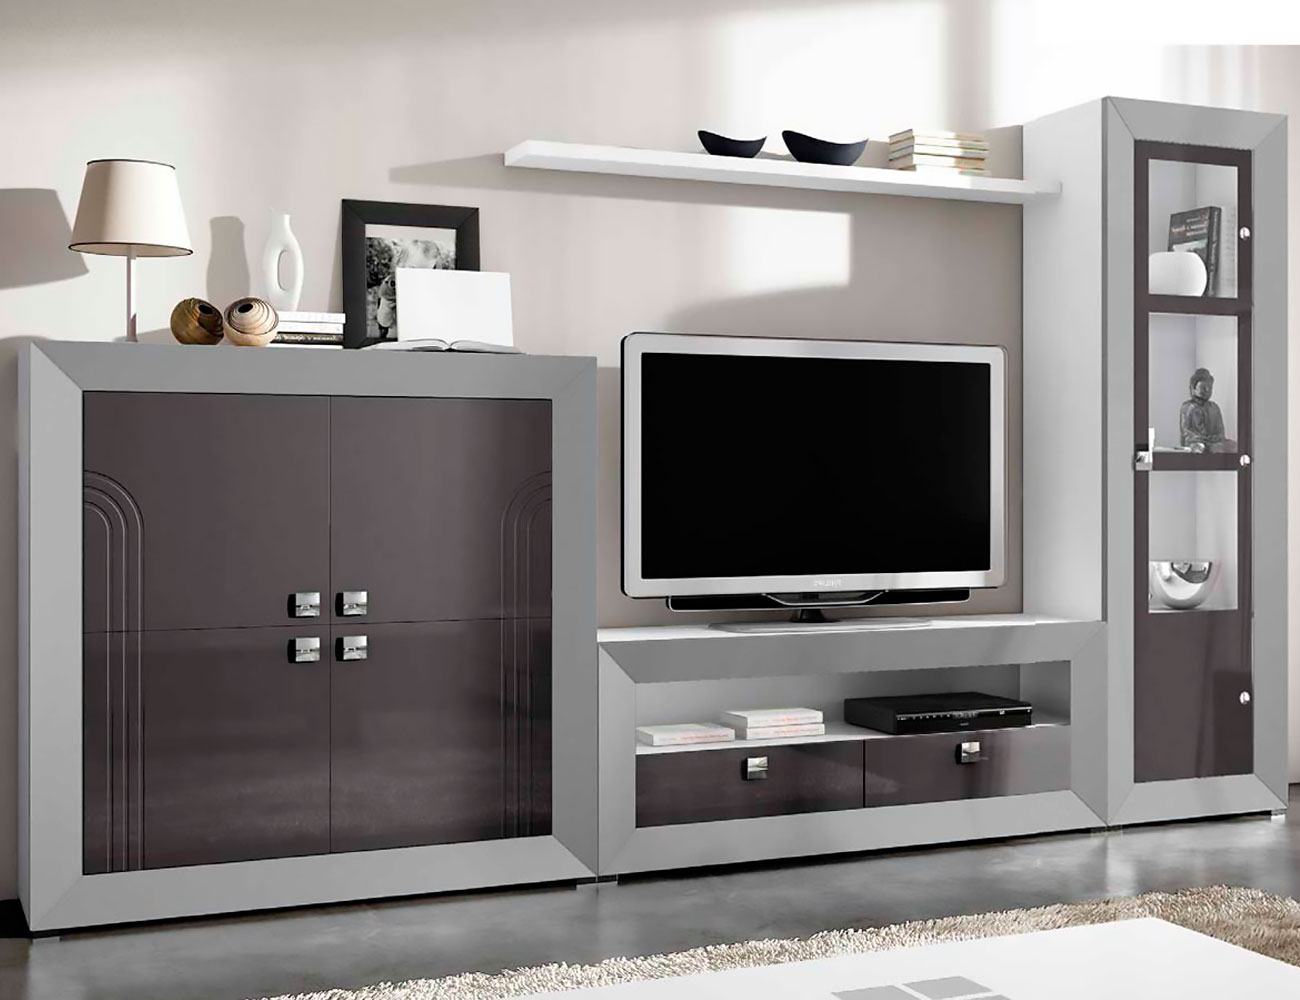 Mueble salon moderno 074